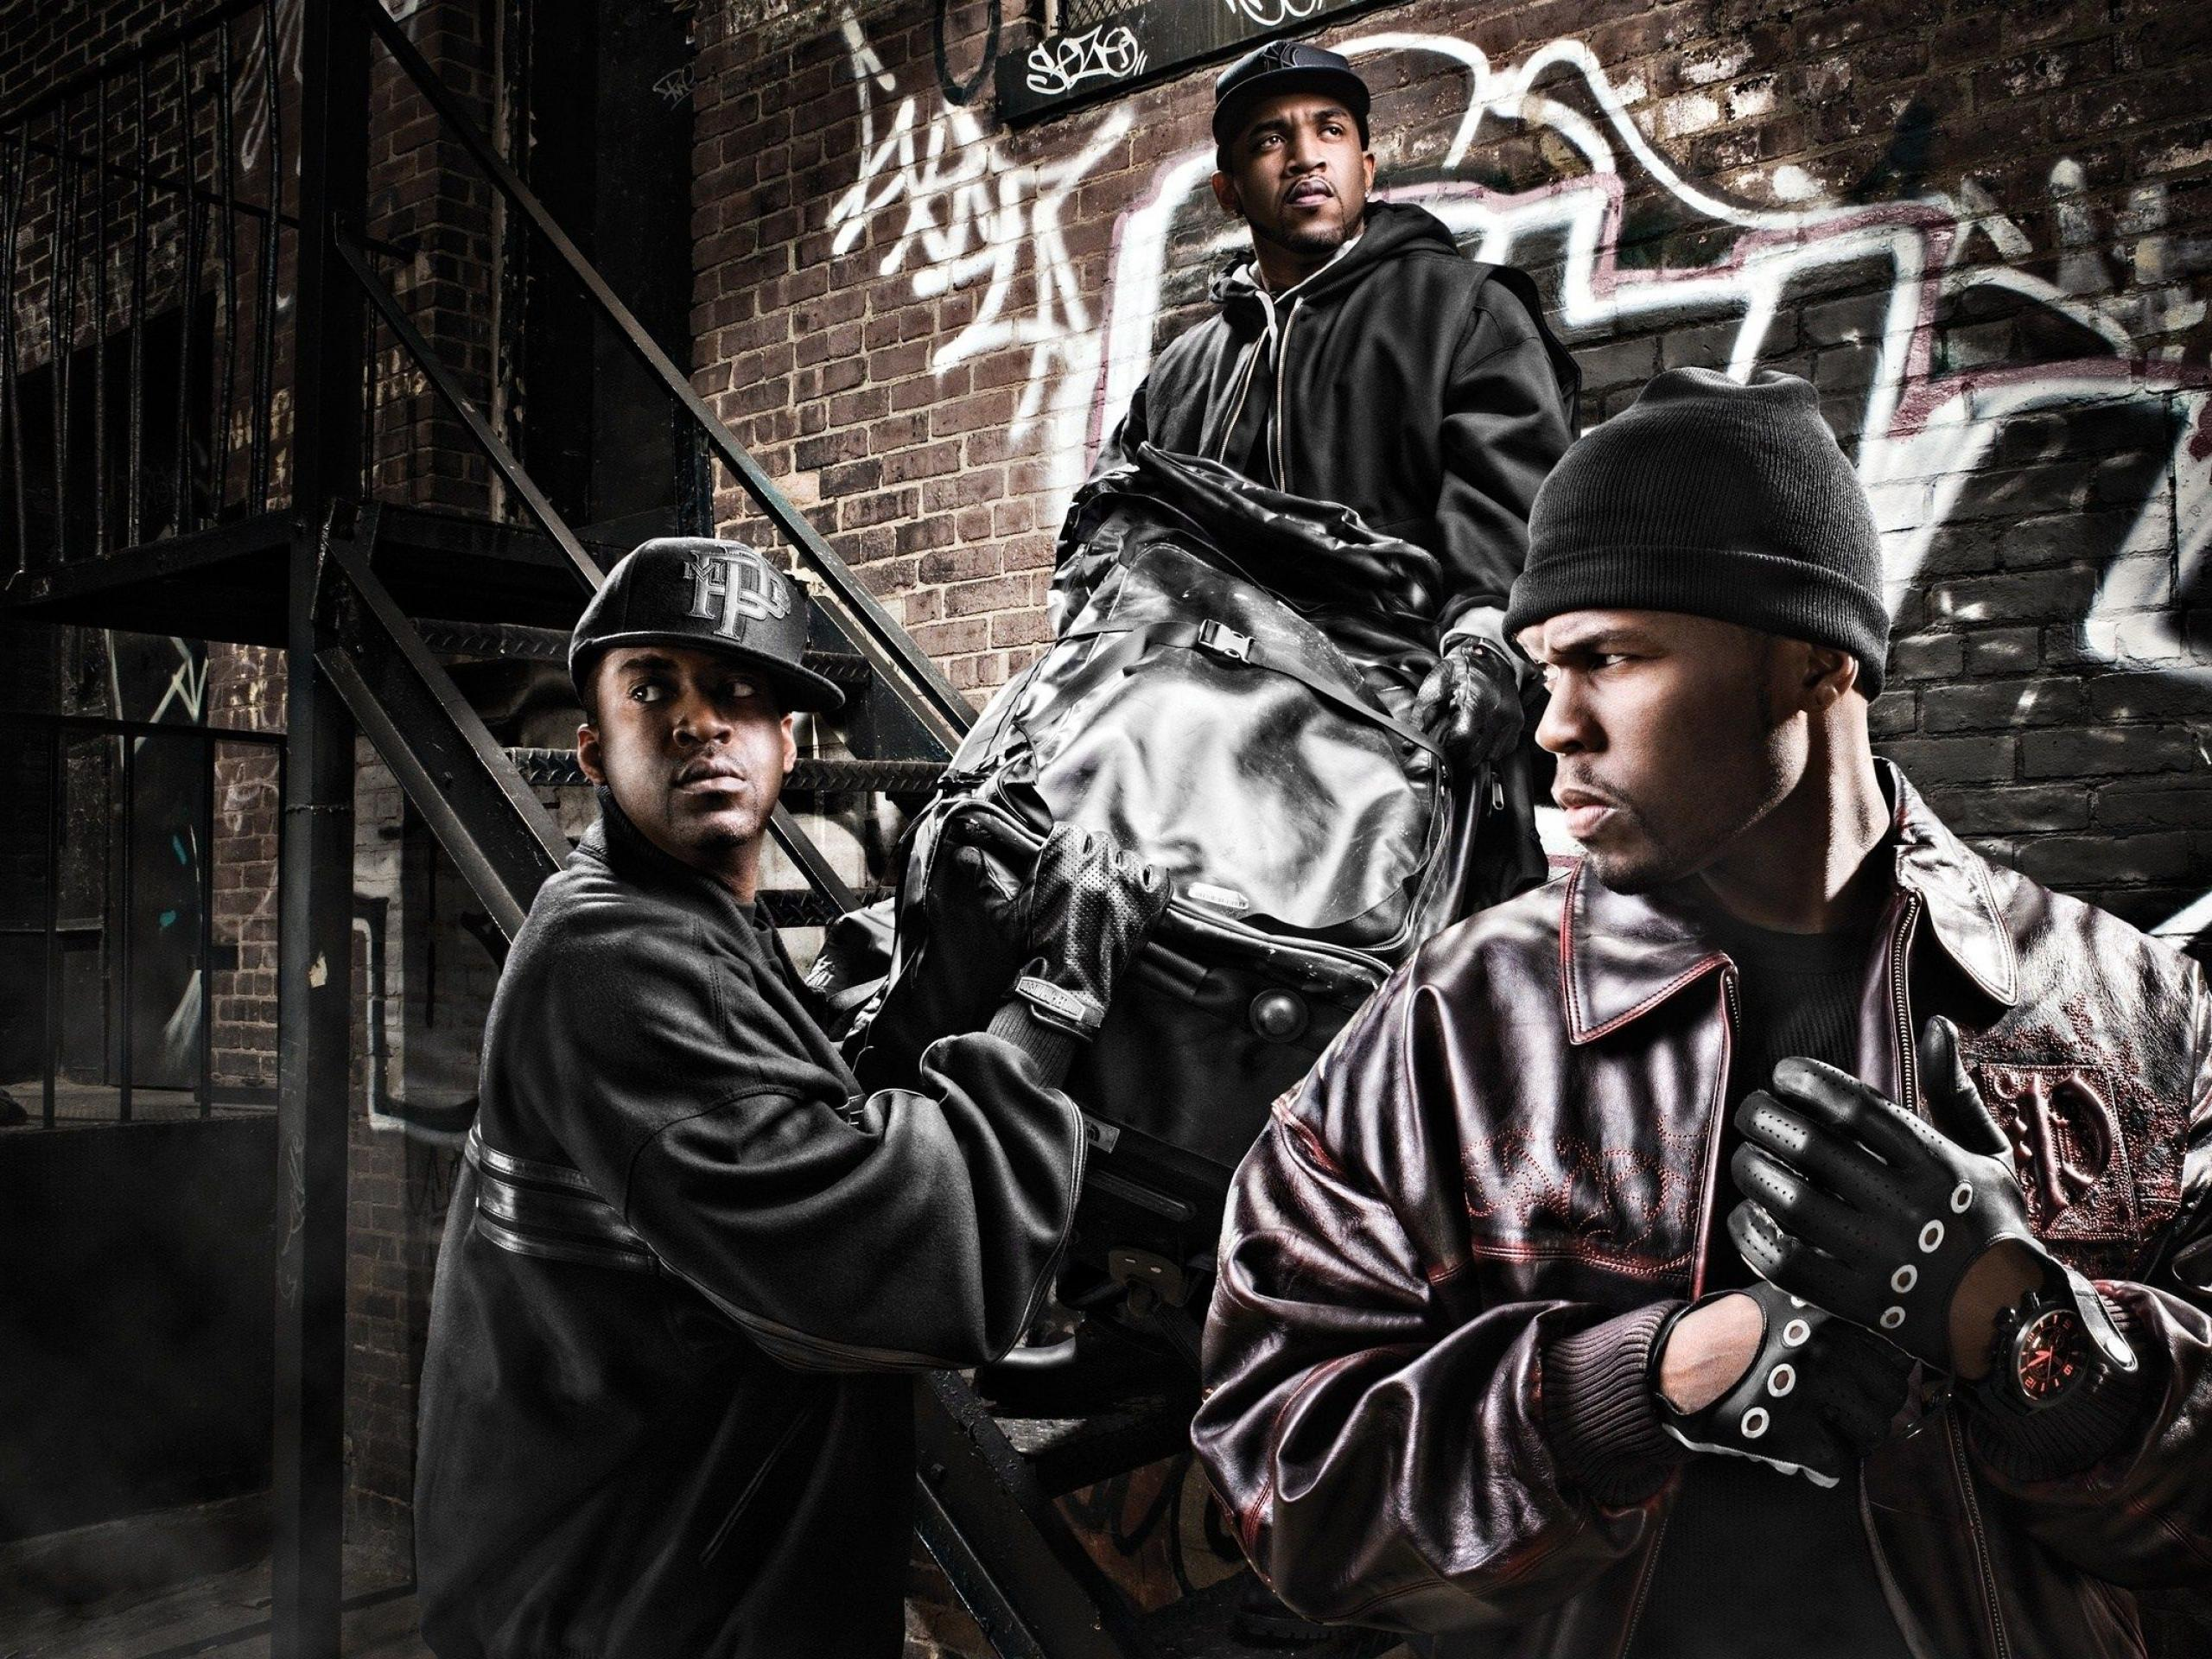 G-Unit-50-Cent-Lloyd-Banks-Tony-Yayo-Rap-Music-1920x2560.jpg (2560×1920)